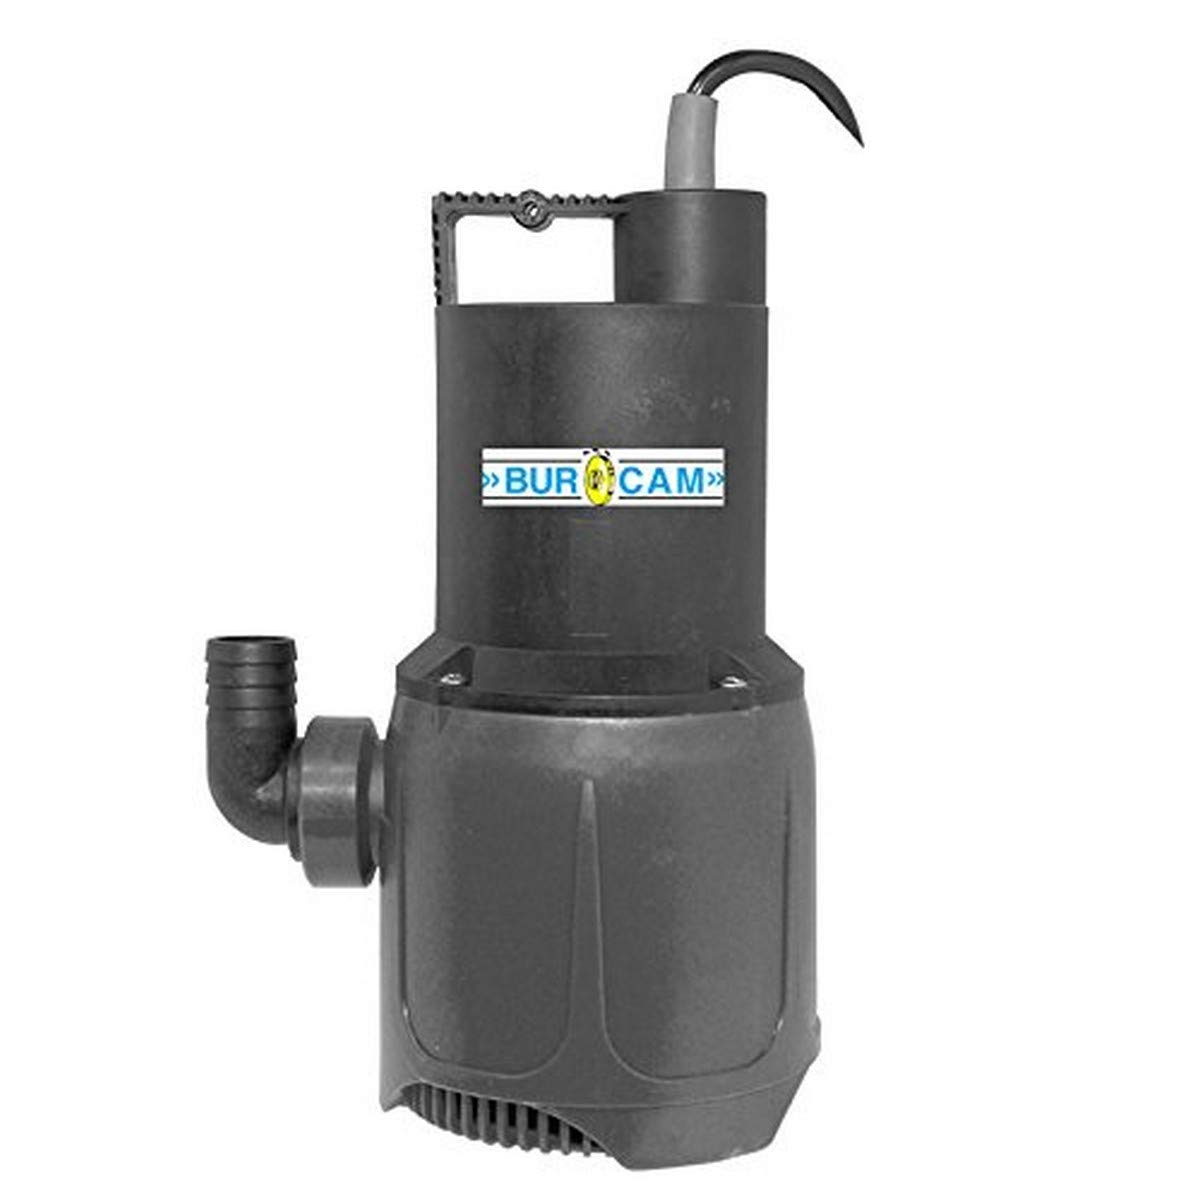 BURCAM 300209DP 12V//120V Water Transfer Utility Pump